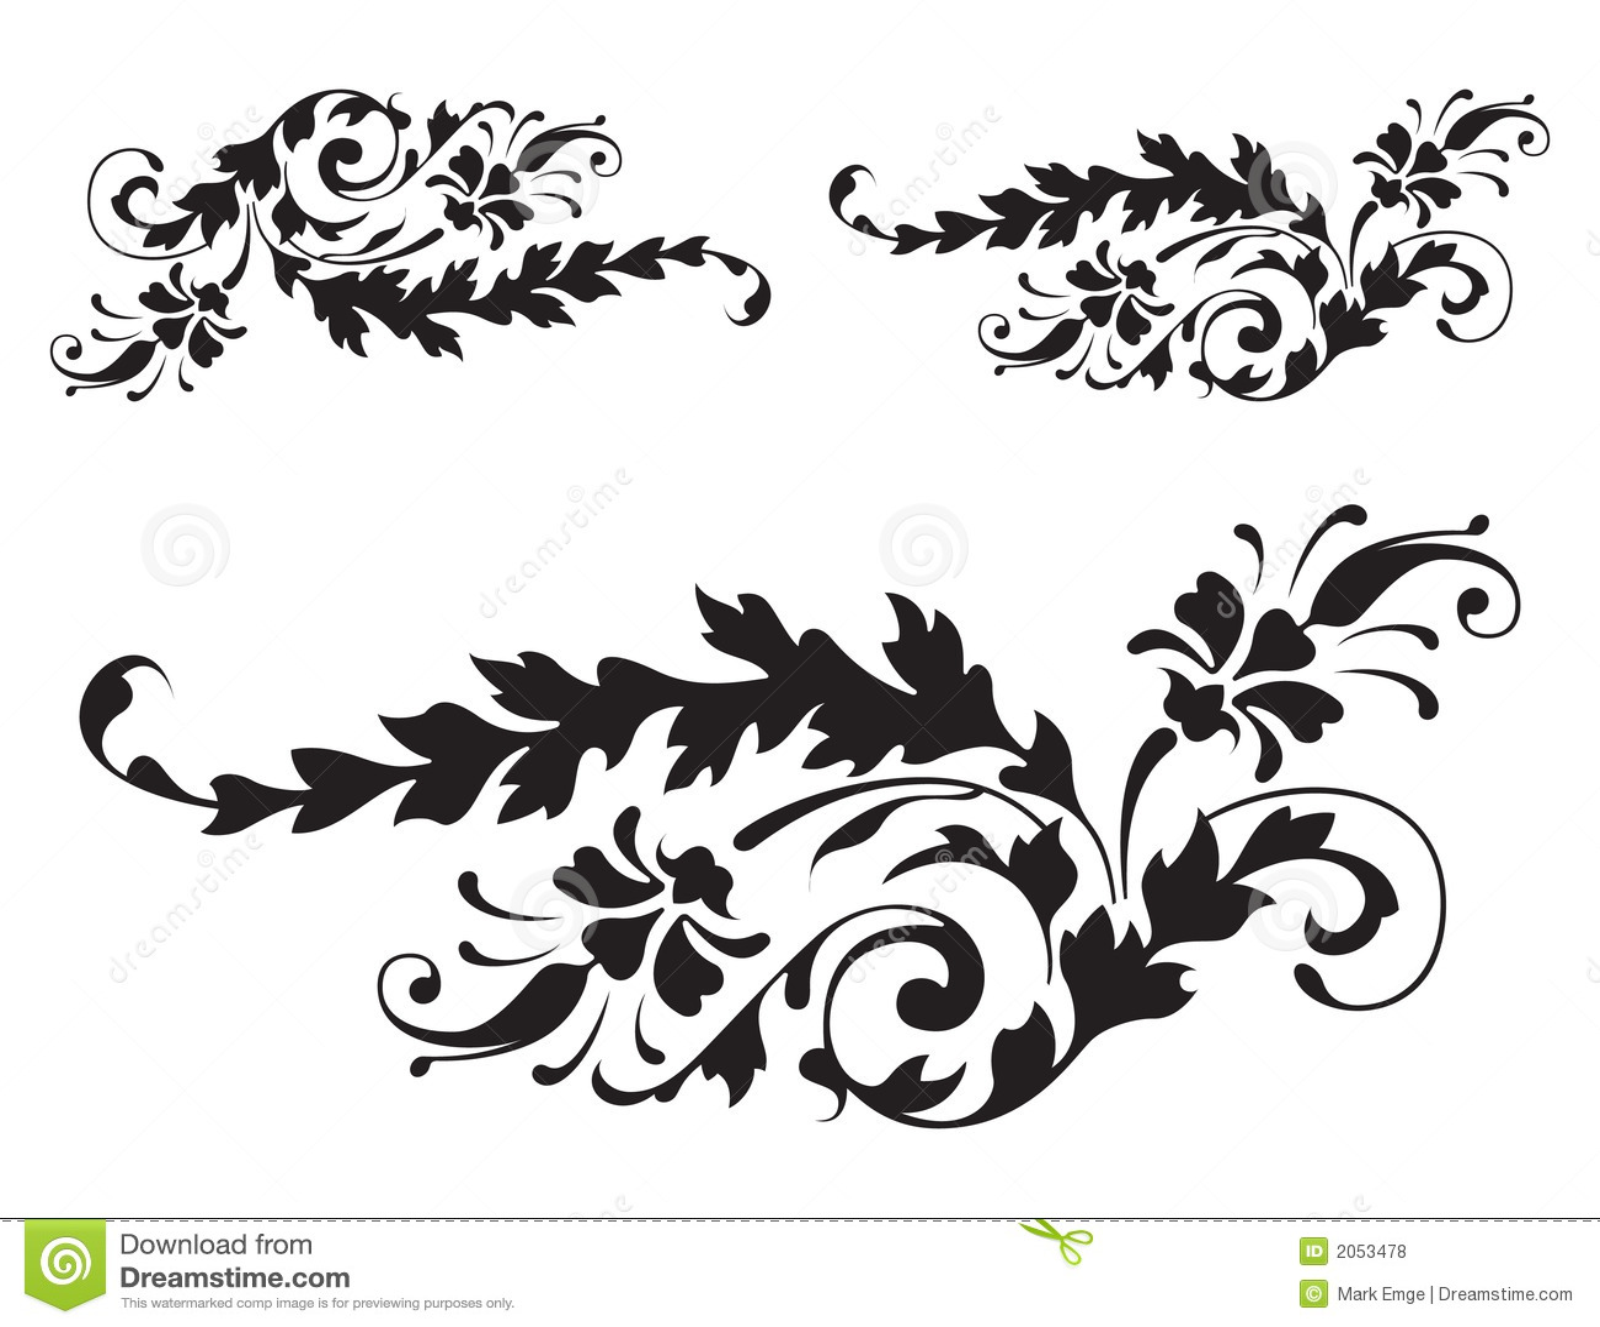 Calligraphy brushes adobe illustrator